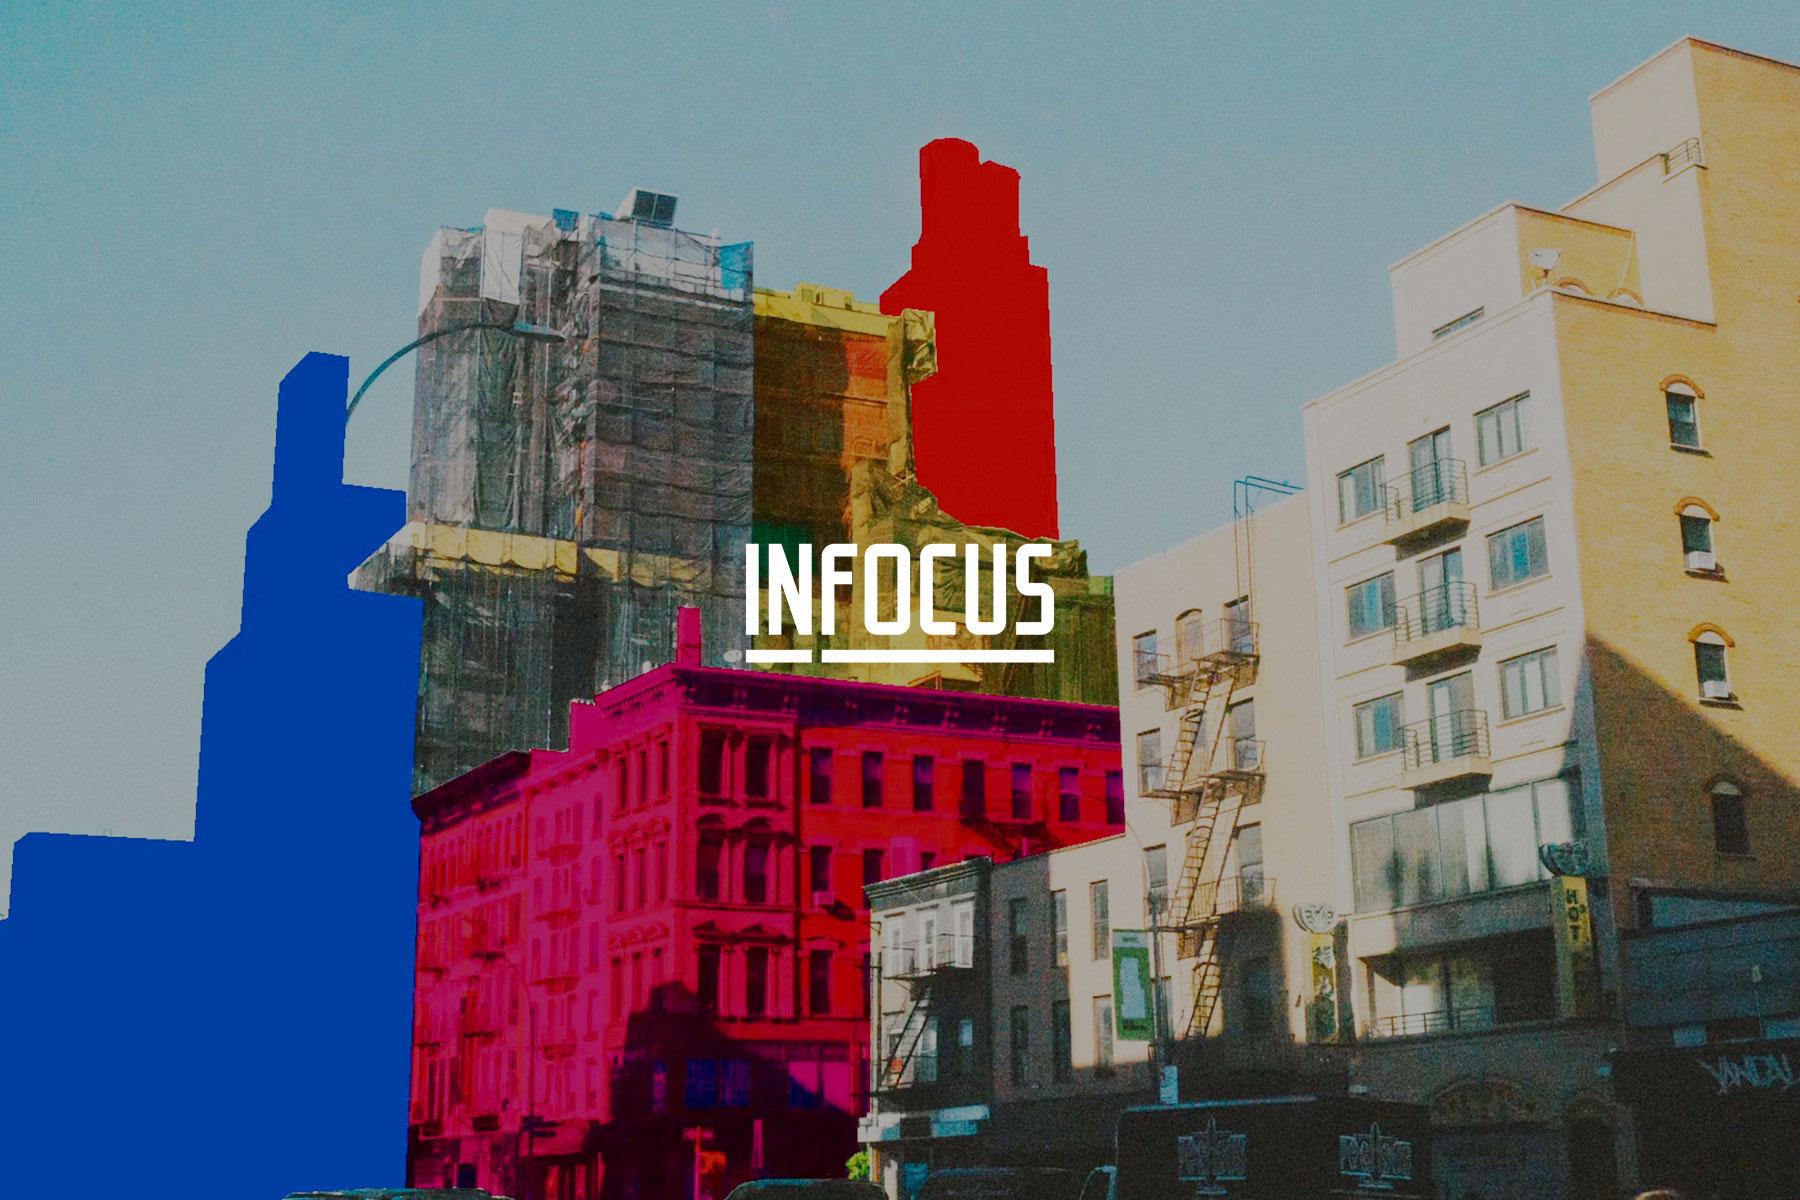 IN FOCUS 株式会社のトップ画像